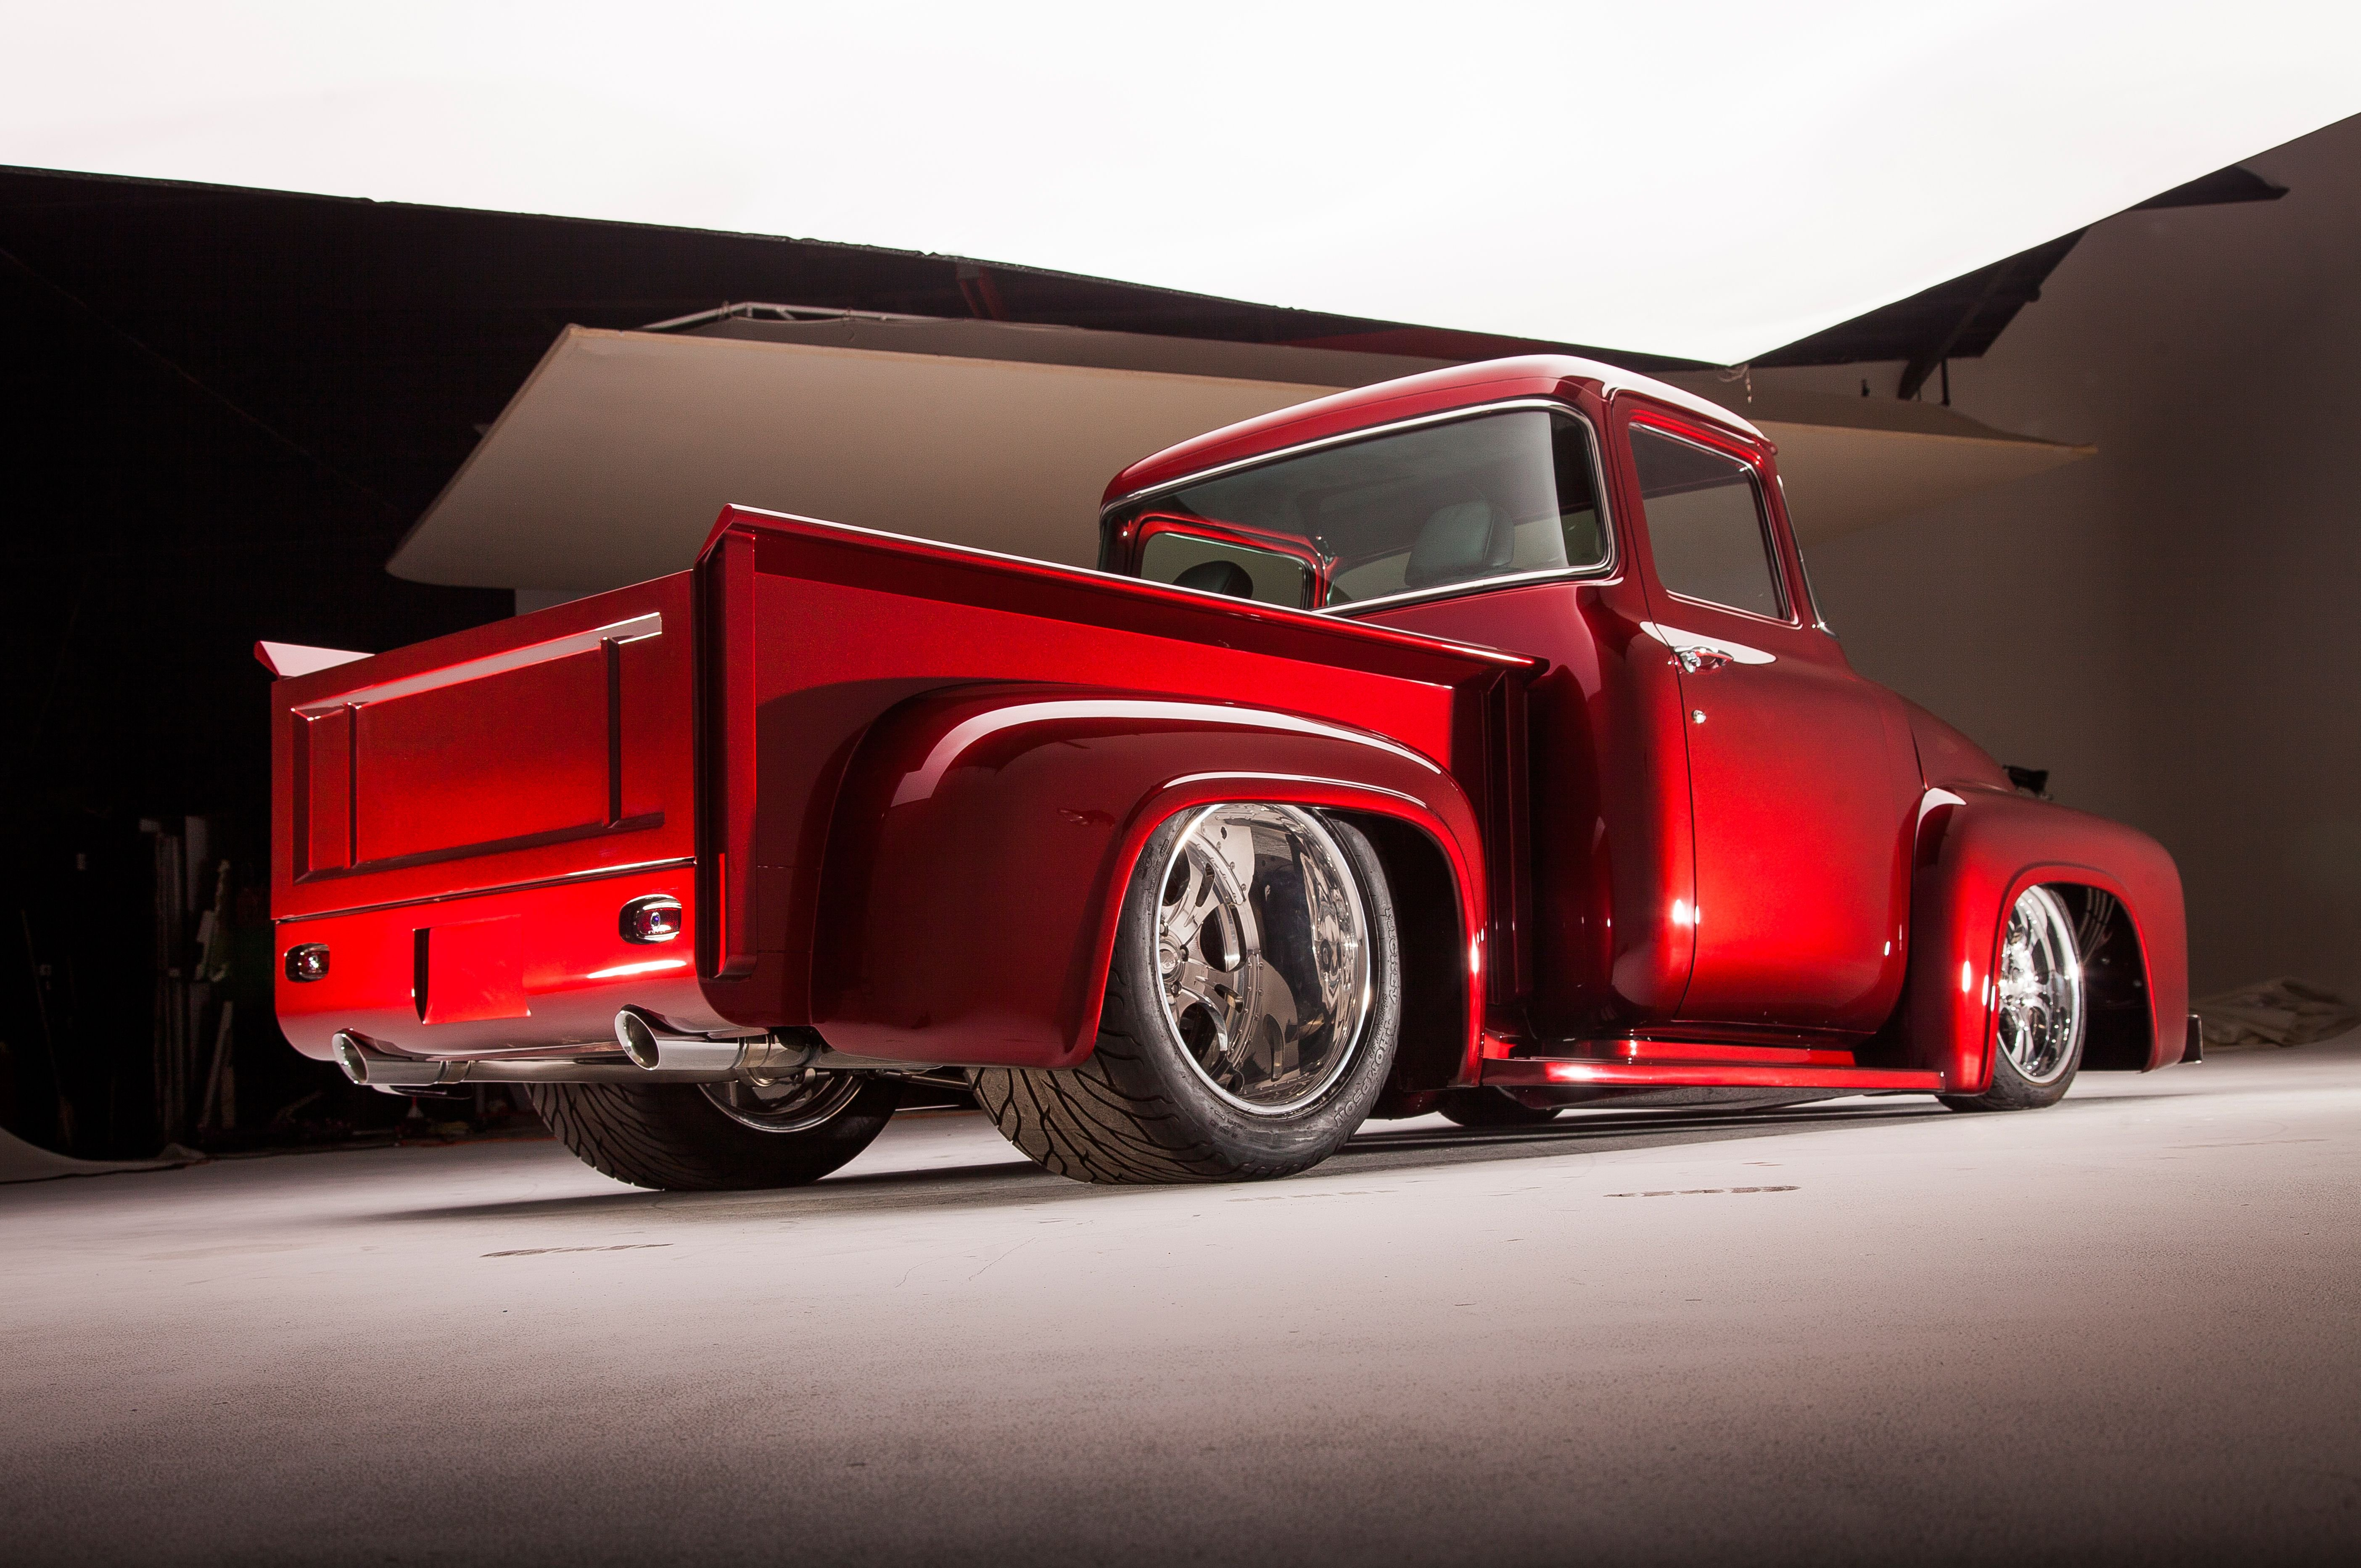 Cars Of Ford >> 1956 Ford F100 Pickup Streetrod Street Rod Hot Hotrod USA 5616x3730-05 wallpaper | 5616x3730 ...